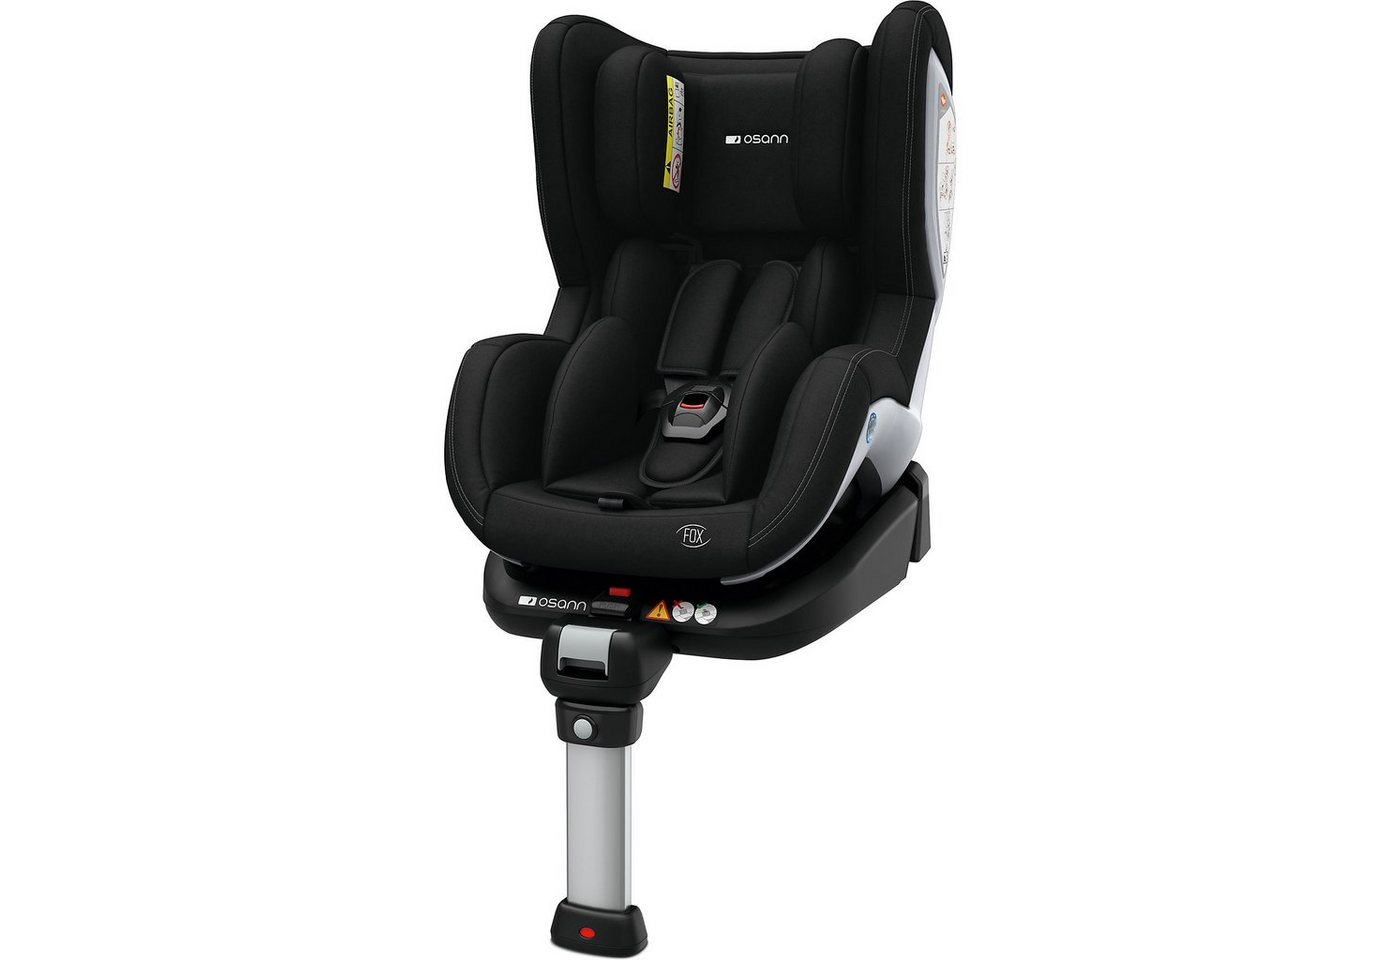 Osann Auto-Kindersitz FOX Schwarz 2018 schwarz   04016428108057